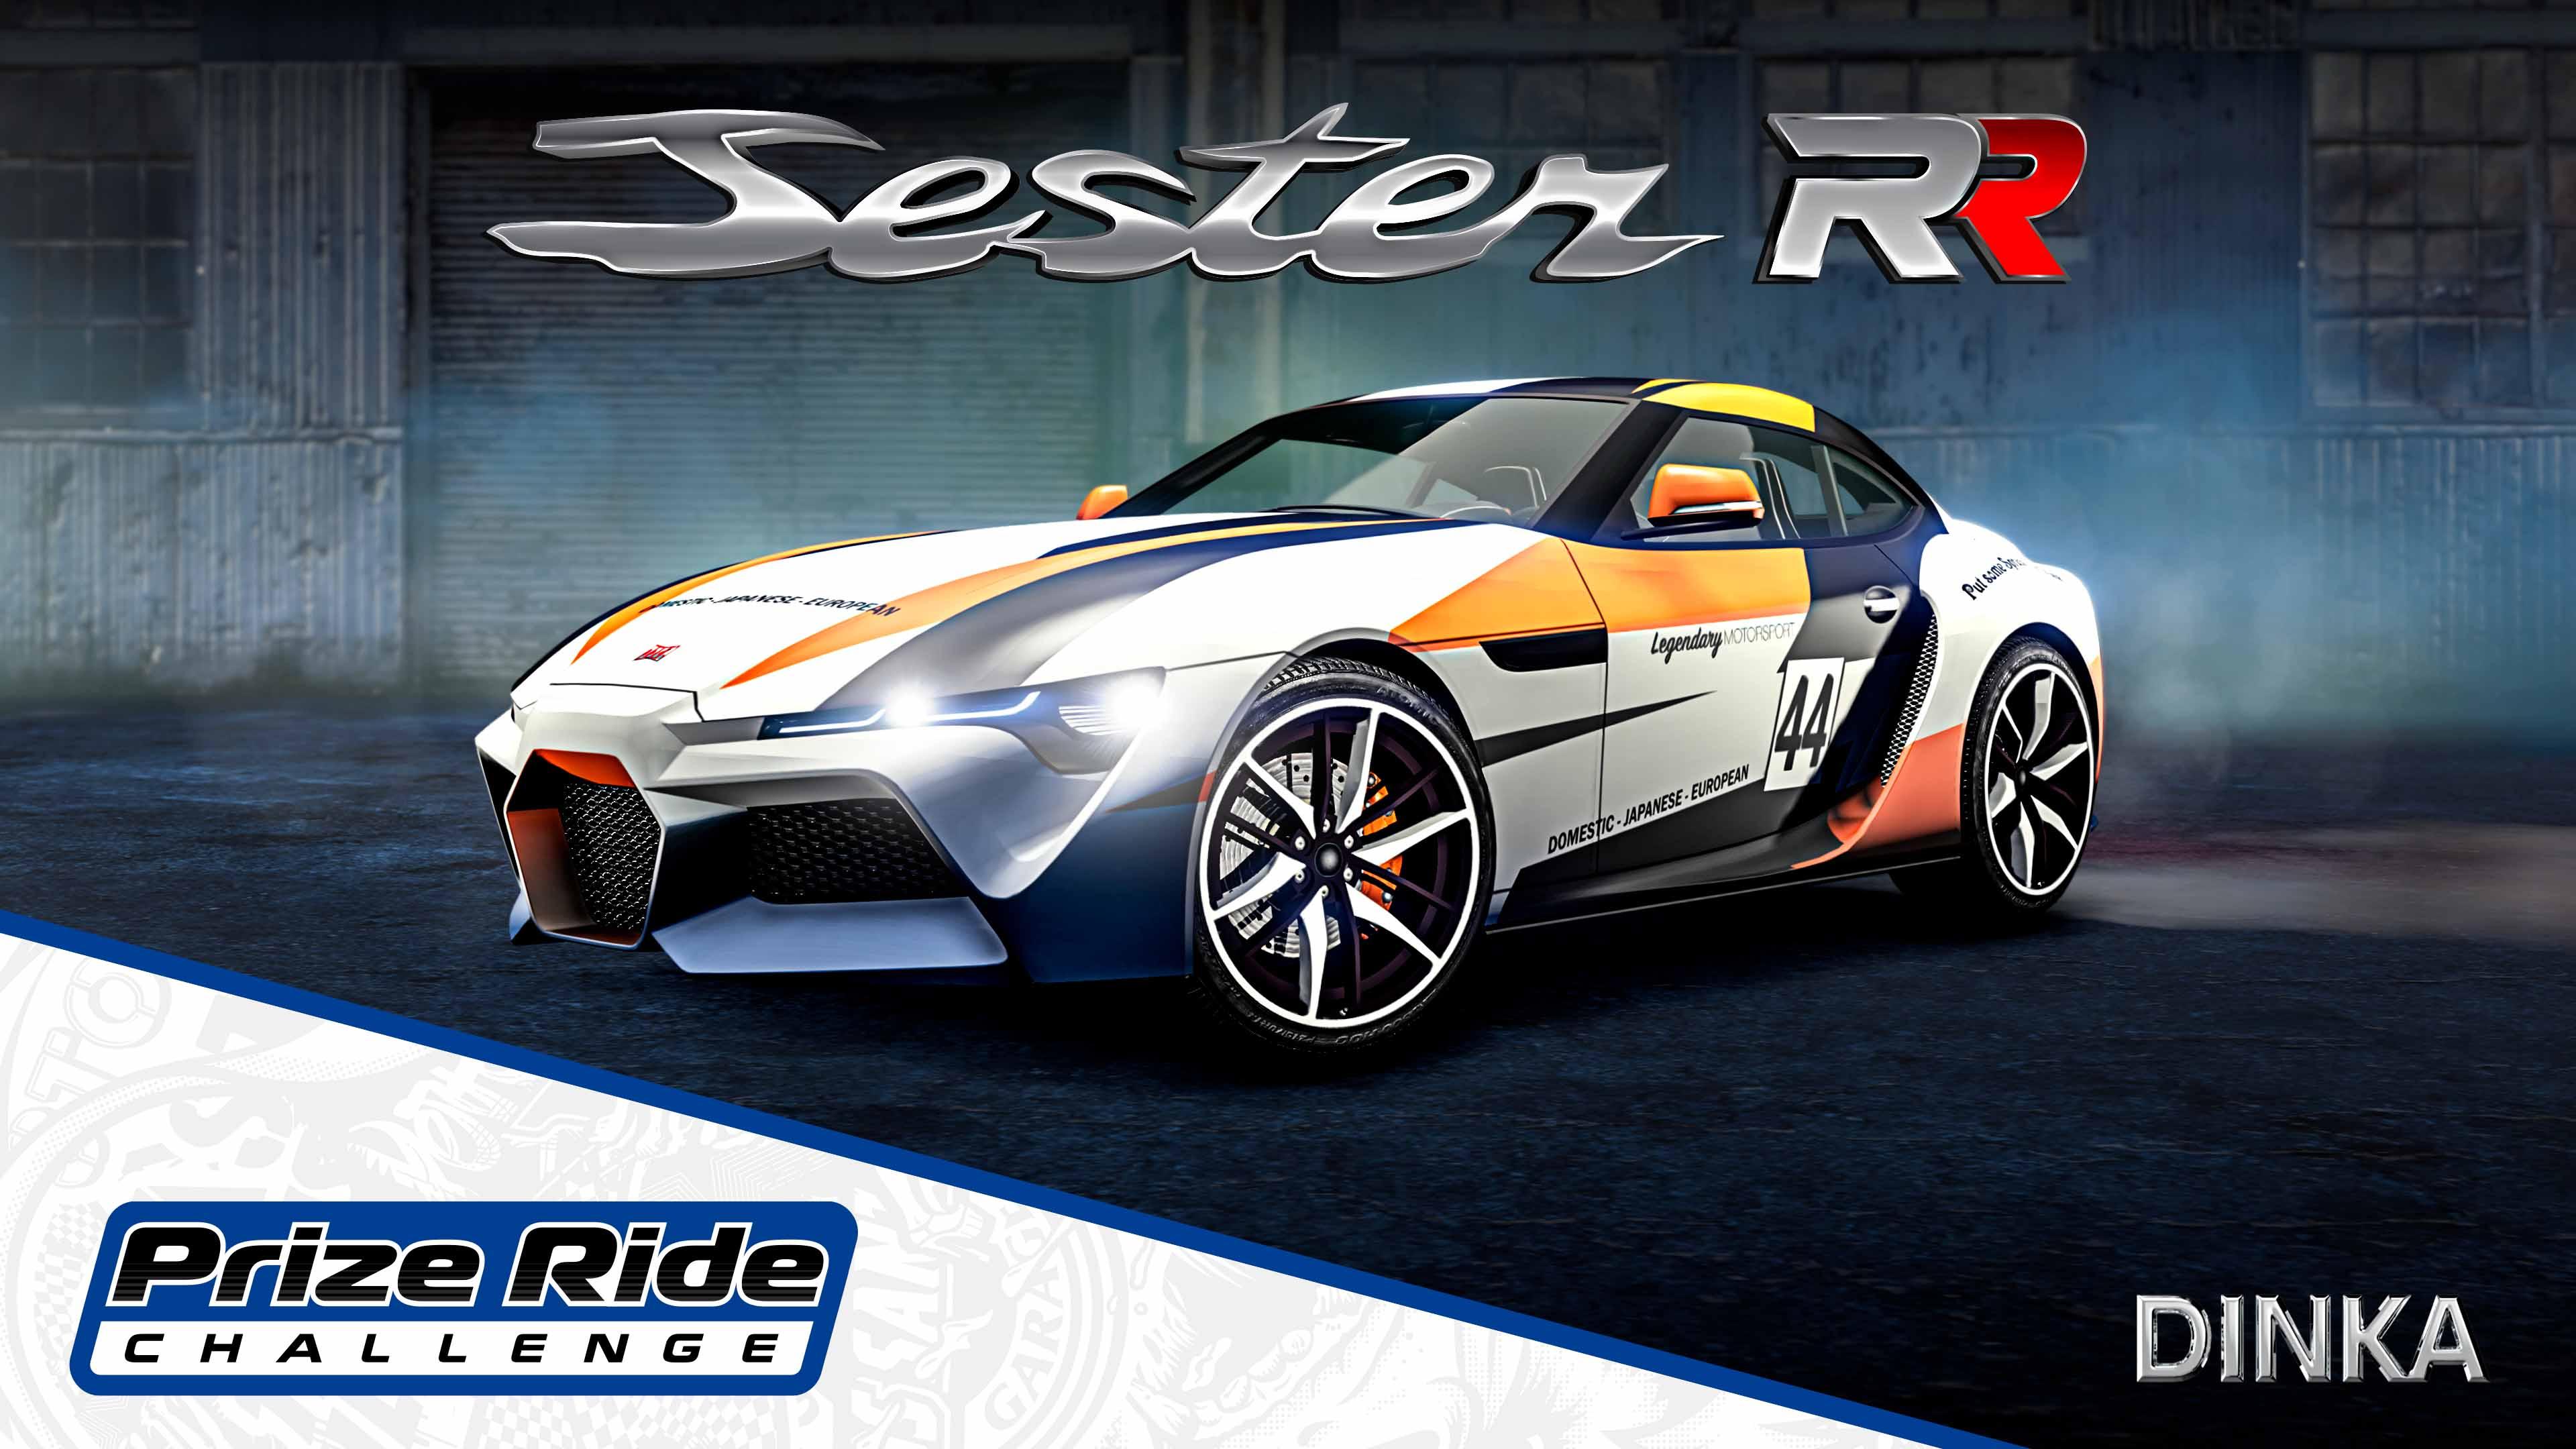 GTA Online Los Santos Tuners Prize Ride: Dinka Jester RR